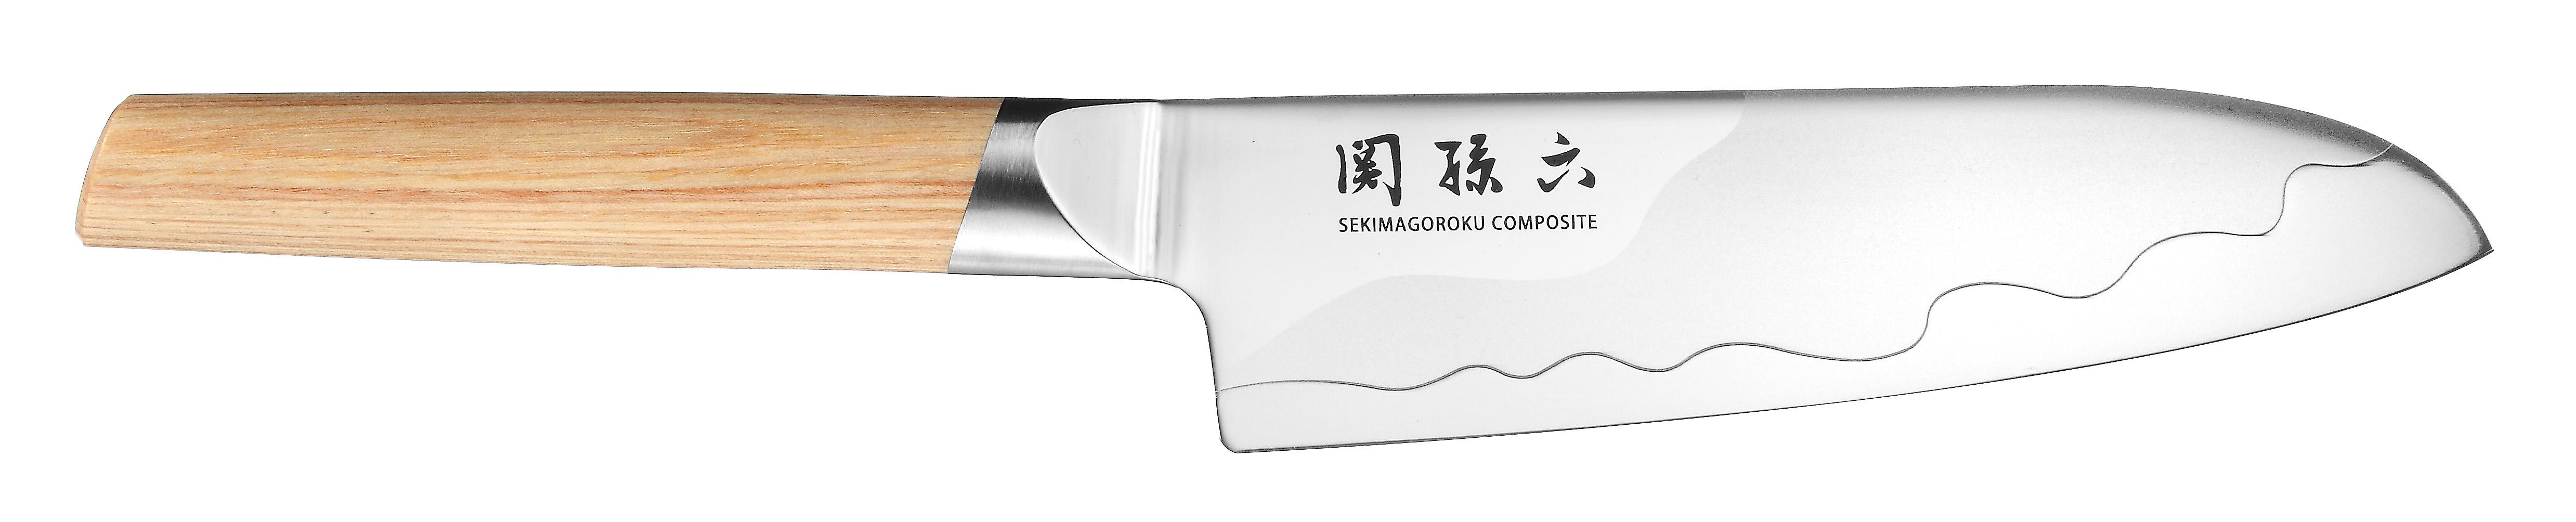 KAI SEKI MAGOROKU COMPOSITE MGC-0402